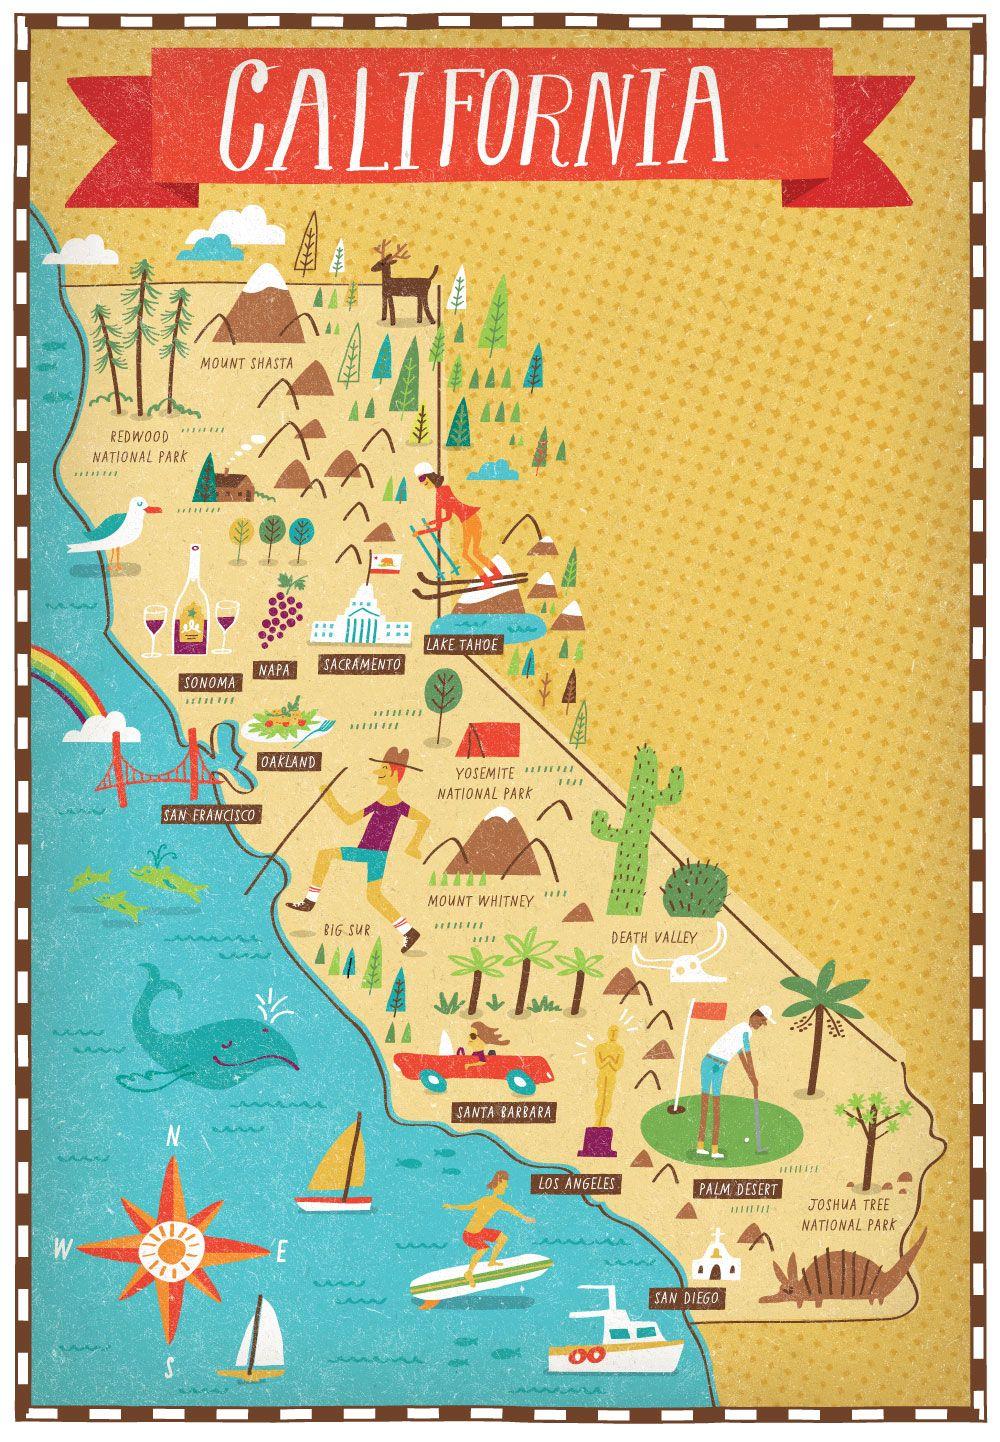 California Map Prints Maps Cities Countries Pinterest - Mapa california